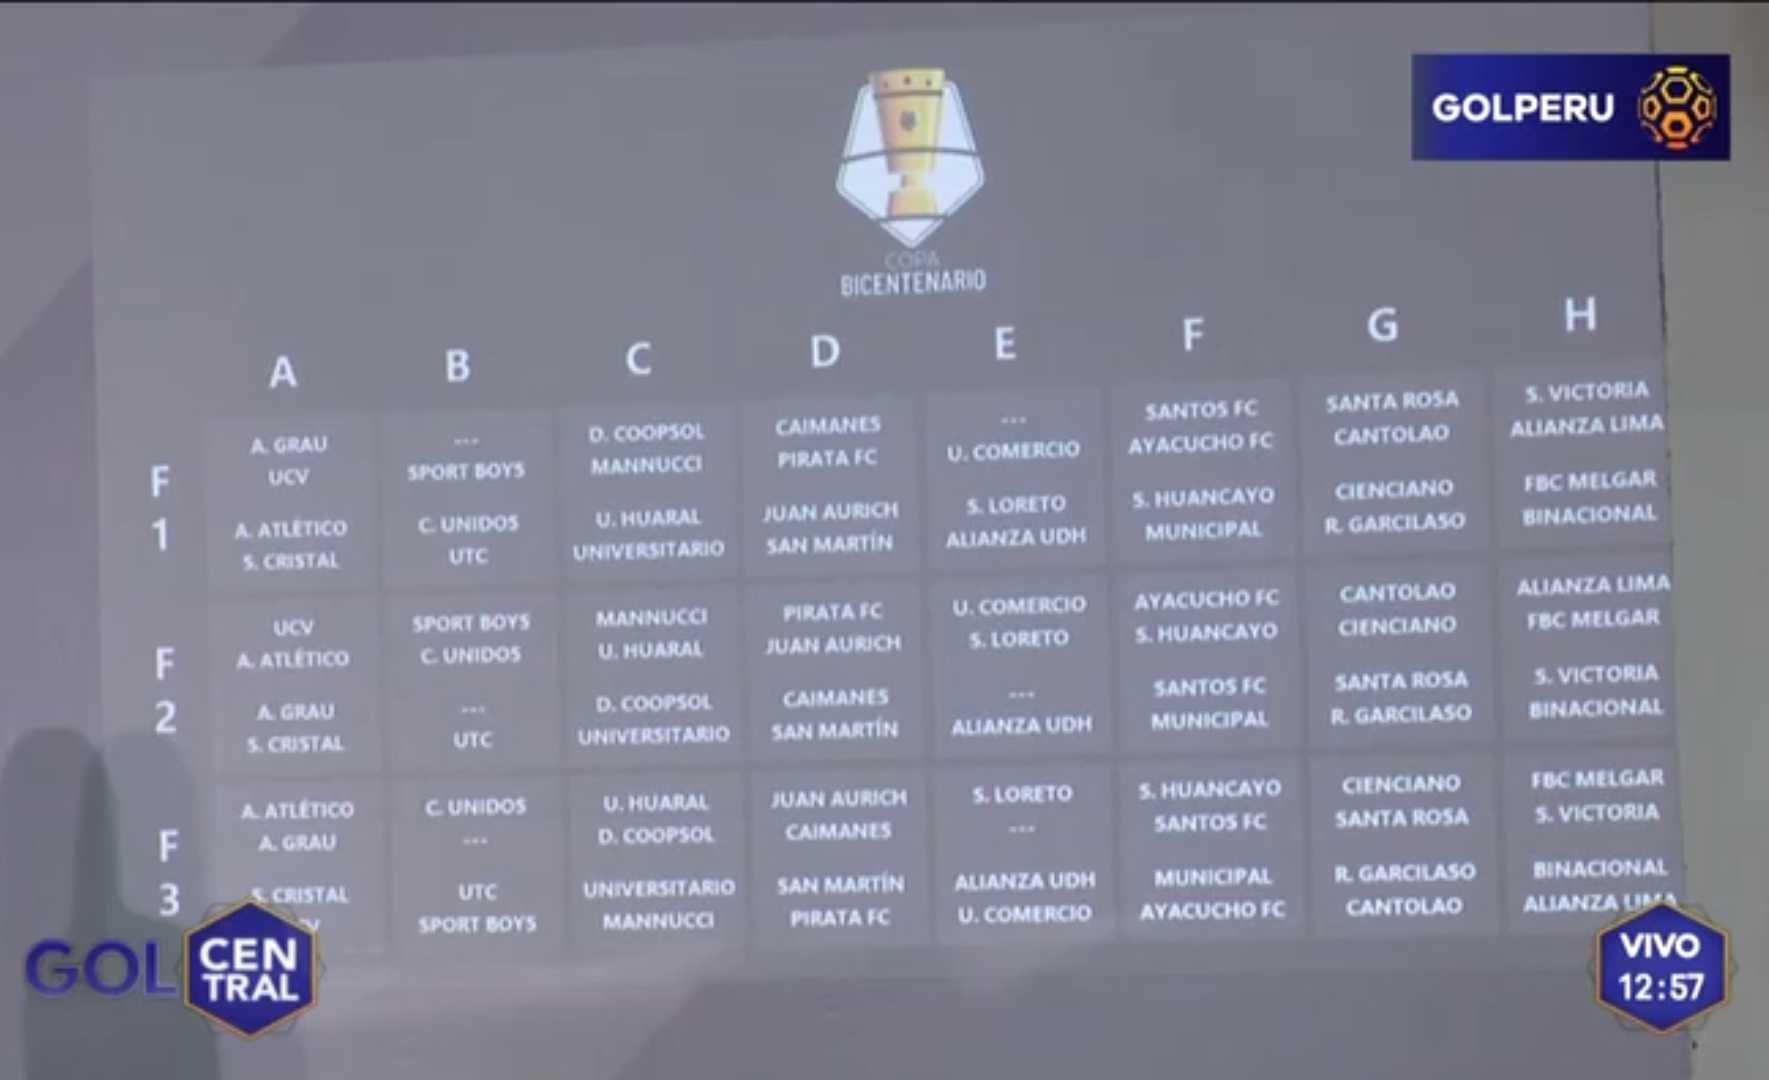 Fixture de la fase de grupos de la Copa Bicentenario. (Captura: Gol Perú)